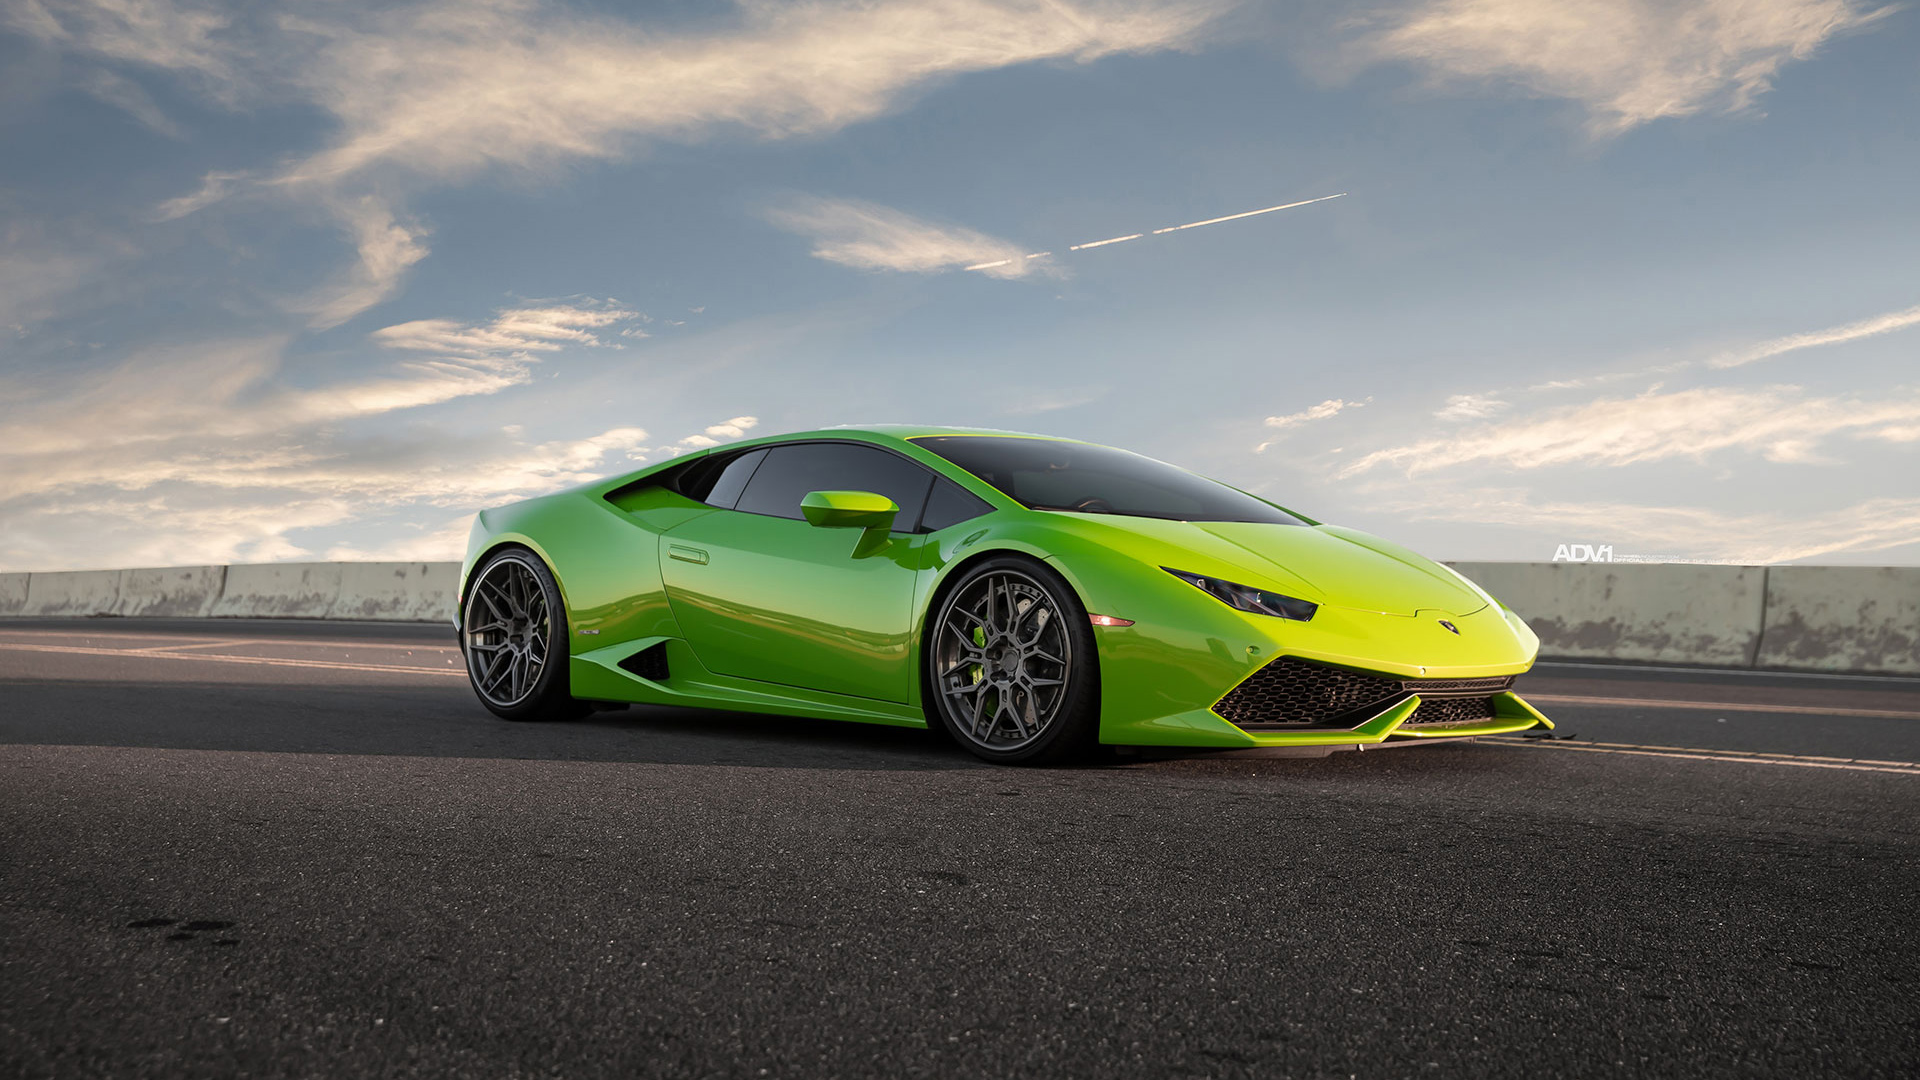 Wallpapers Green And Lamborghini On Pinterest: Verde Mantis Green Lamborghini Huracan LP610 4 Wallpaper